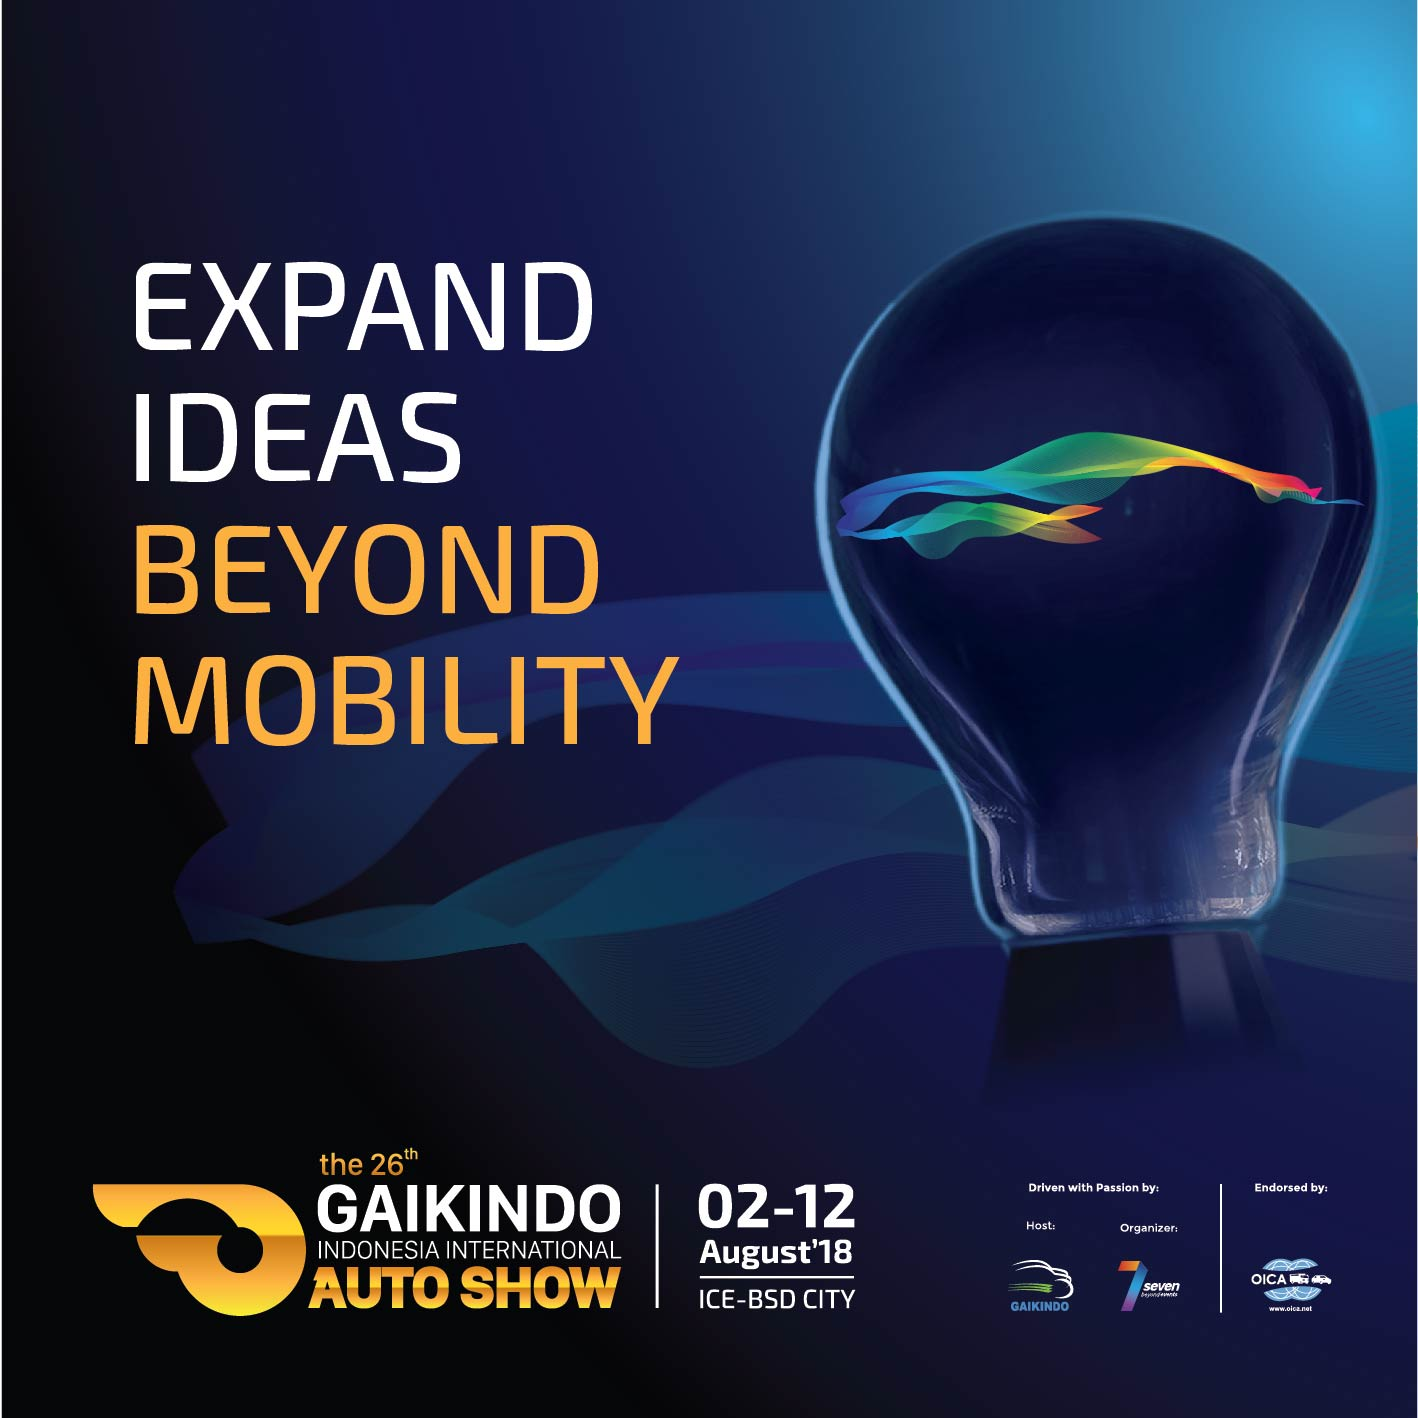 GIIAS 2018 Kemas Semangat Beyond Mobility dalam Berbagai Program